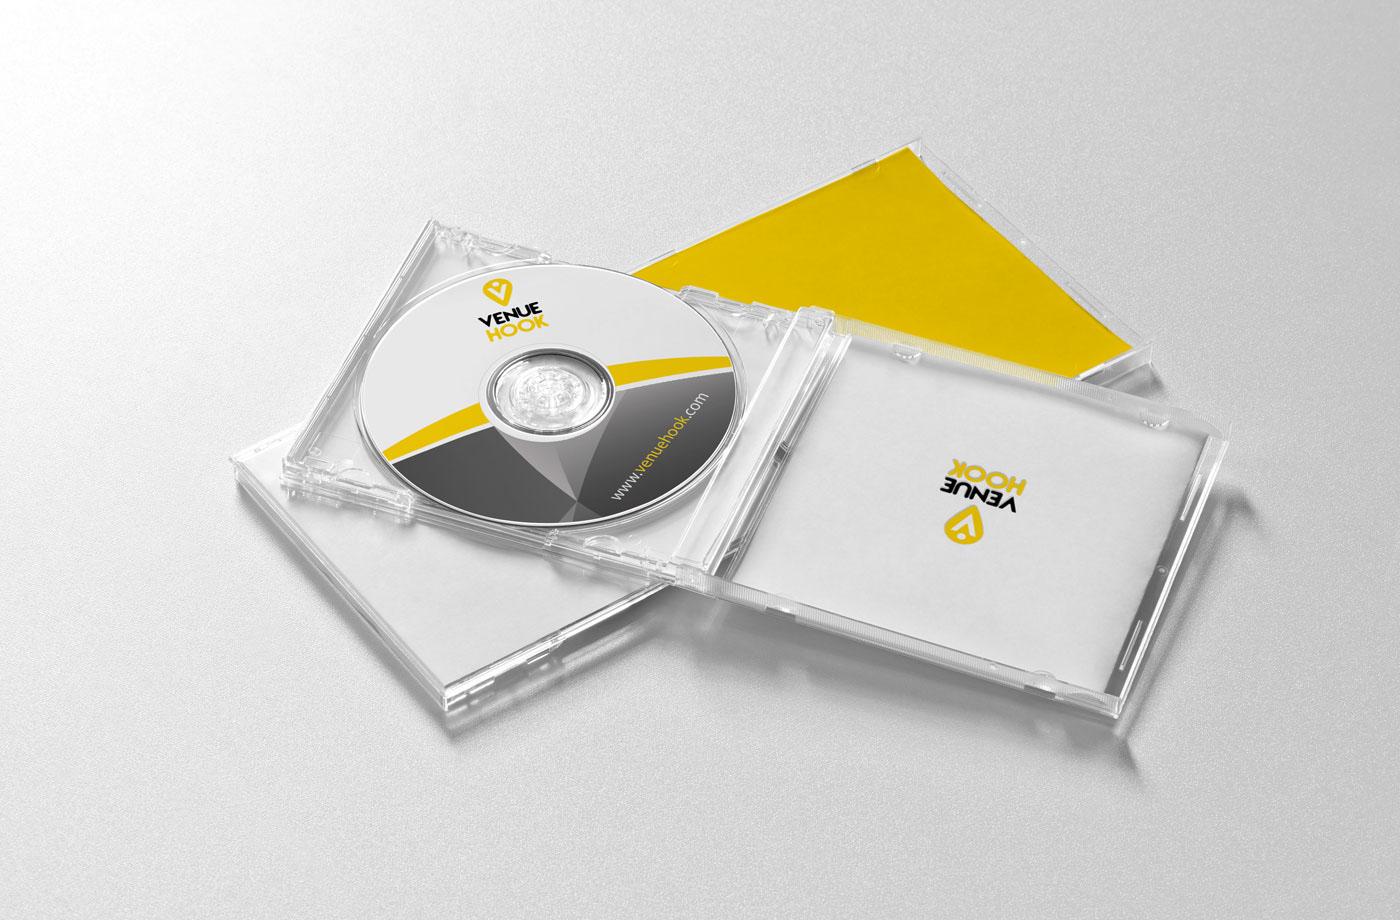 graphic cd cover print venue hook design Event online wedding